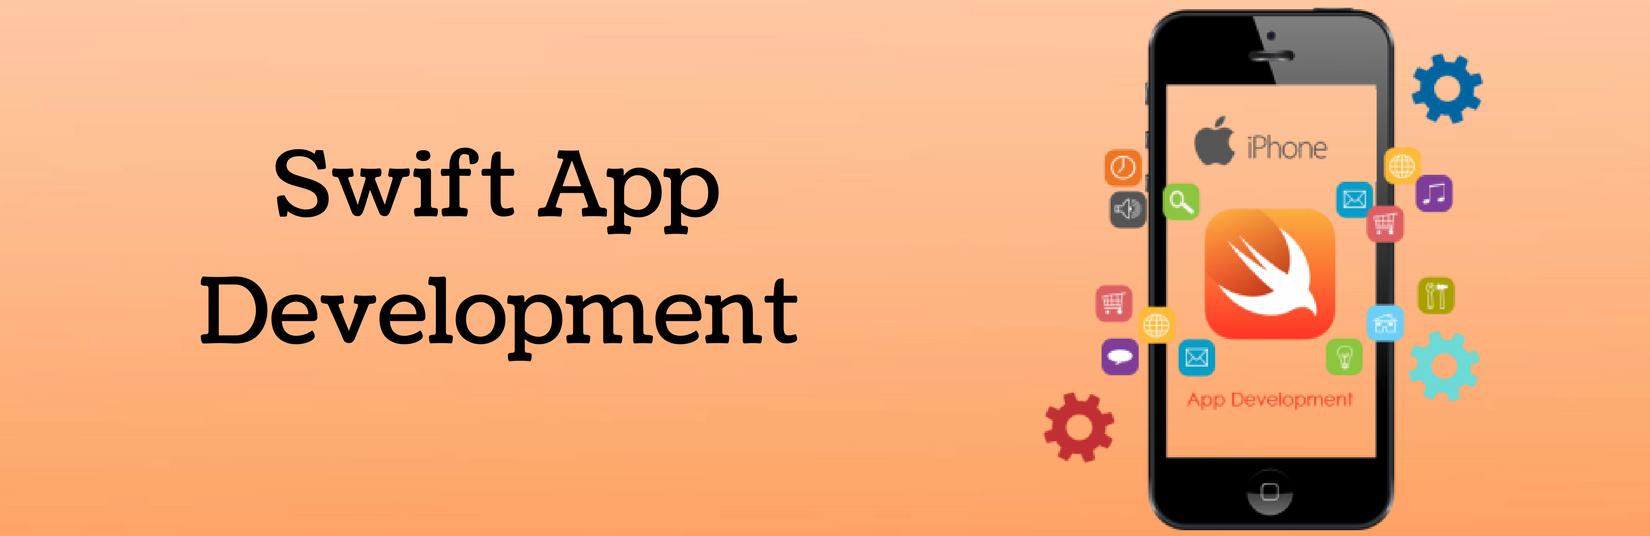 swift-app-development